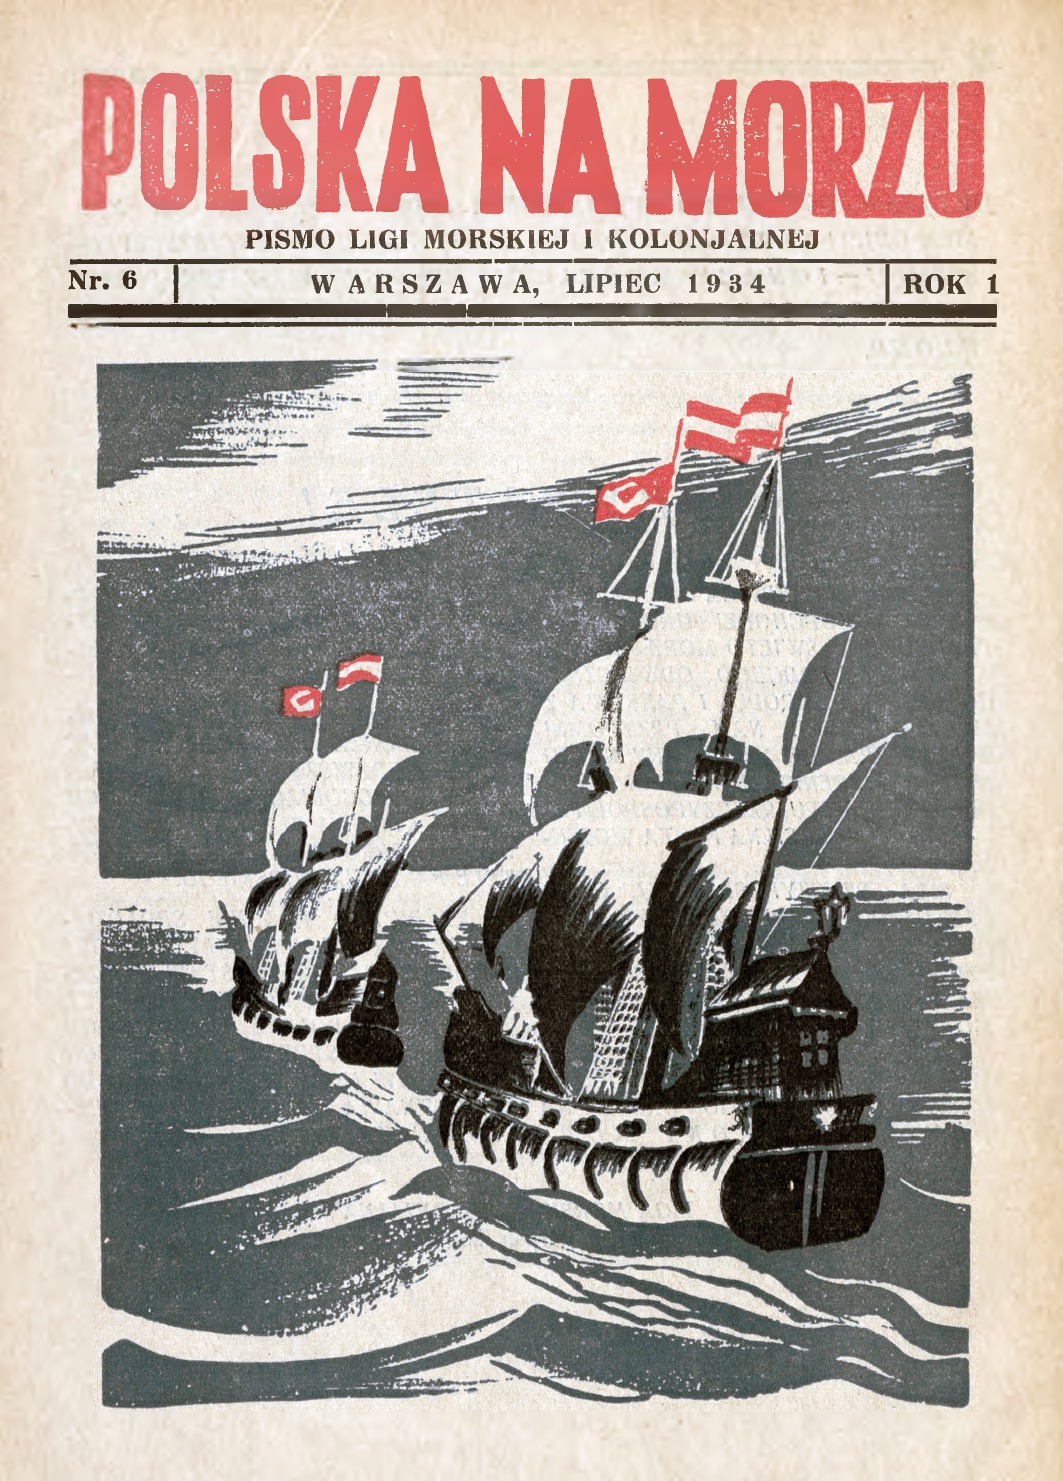 Polska na Morzu : pismo Ligi Morskiej i Kolonjalnej. - Liga Morska i Kolonialna, 1934, nr 6